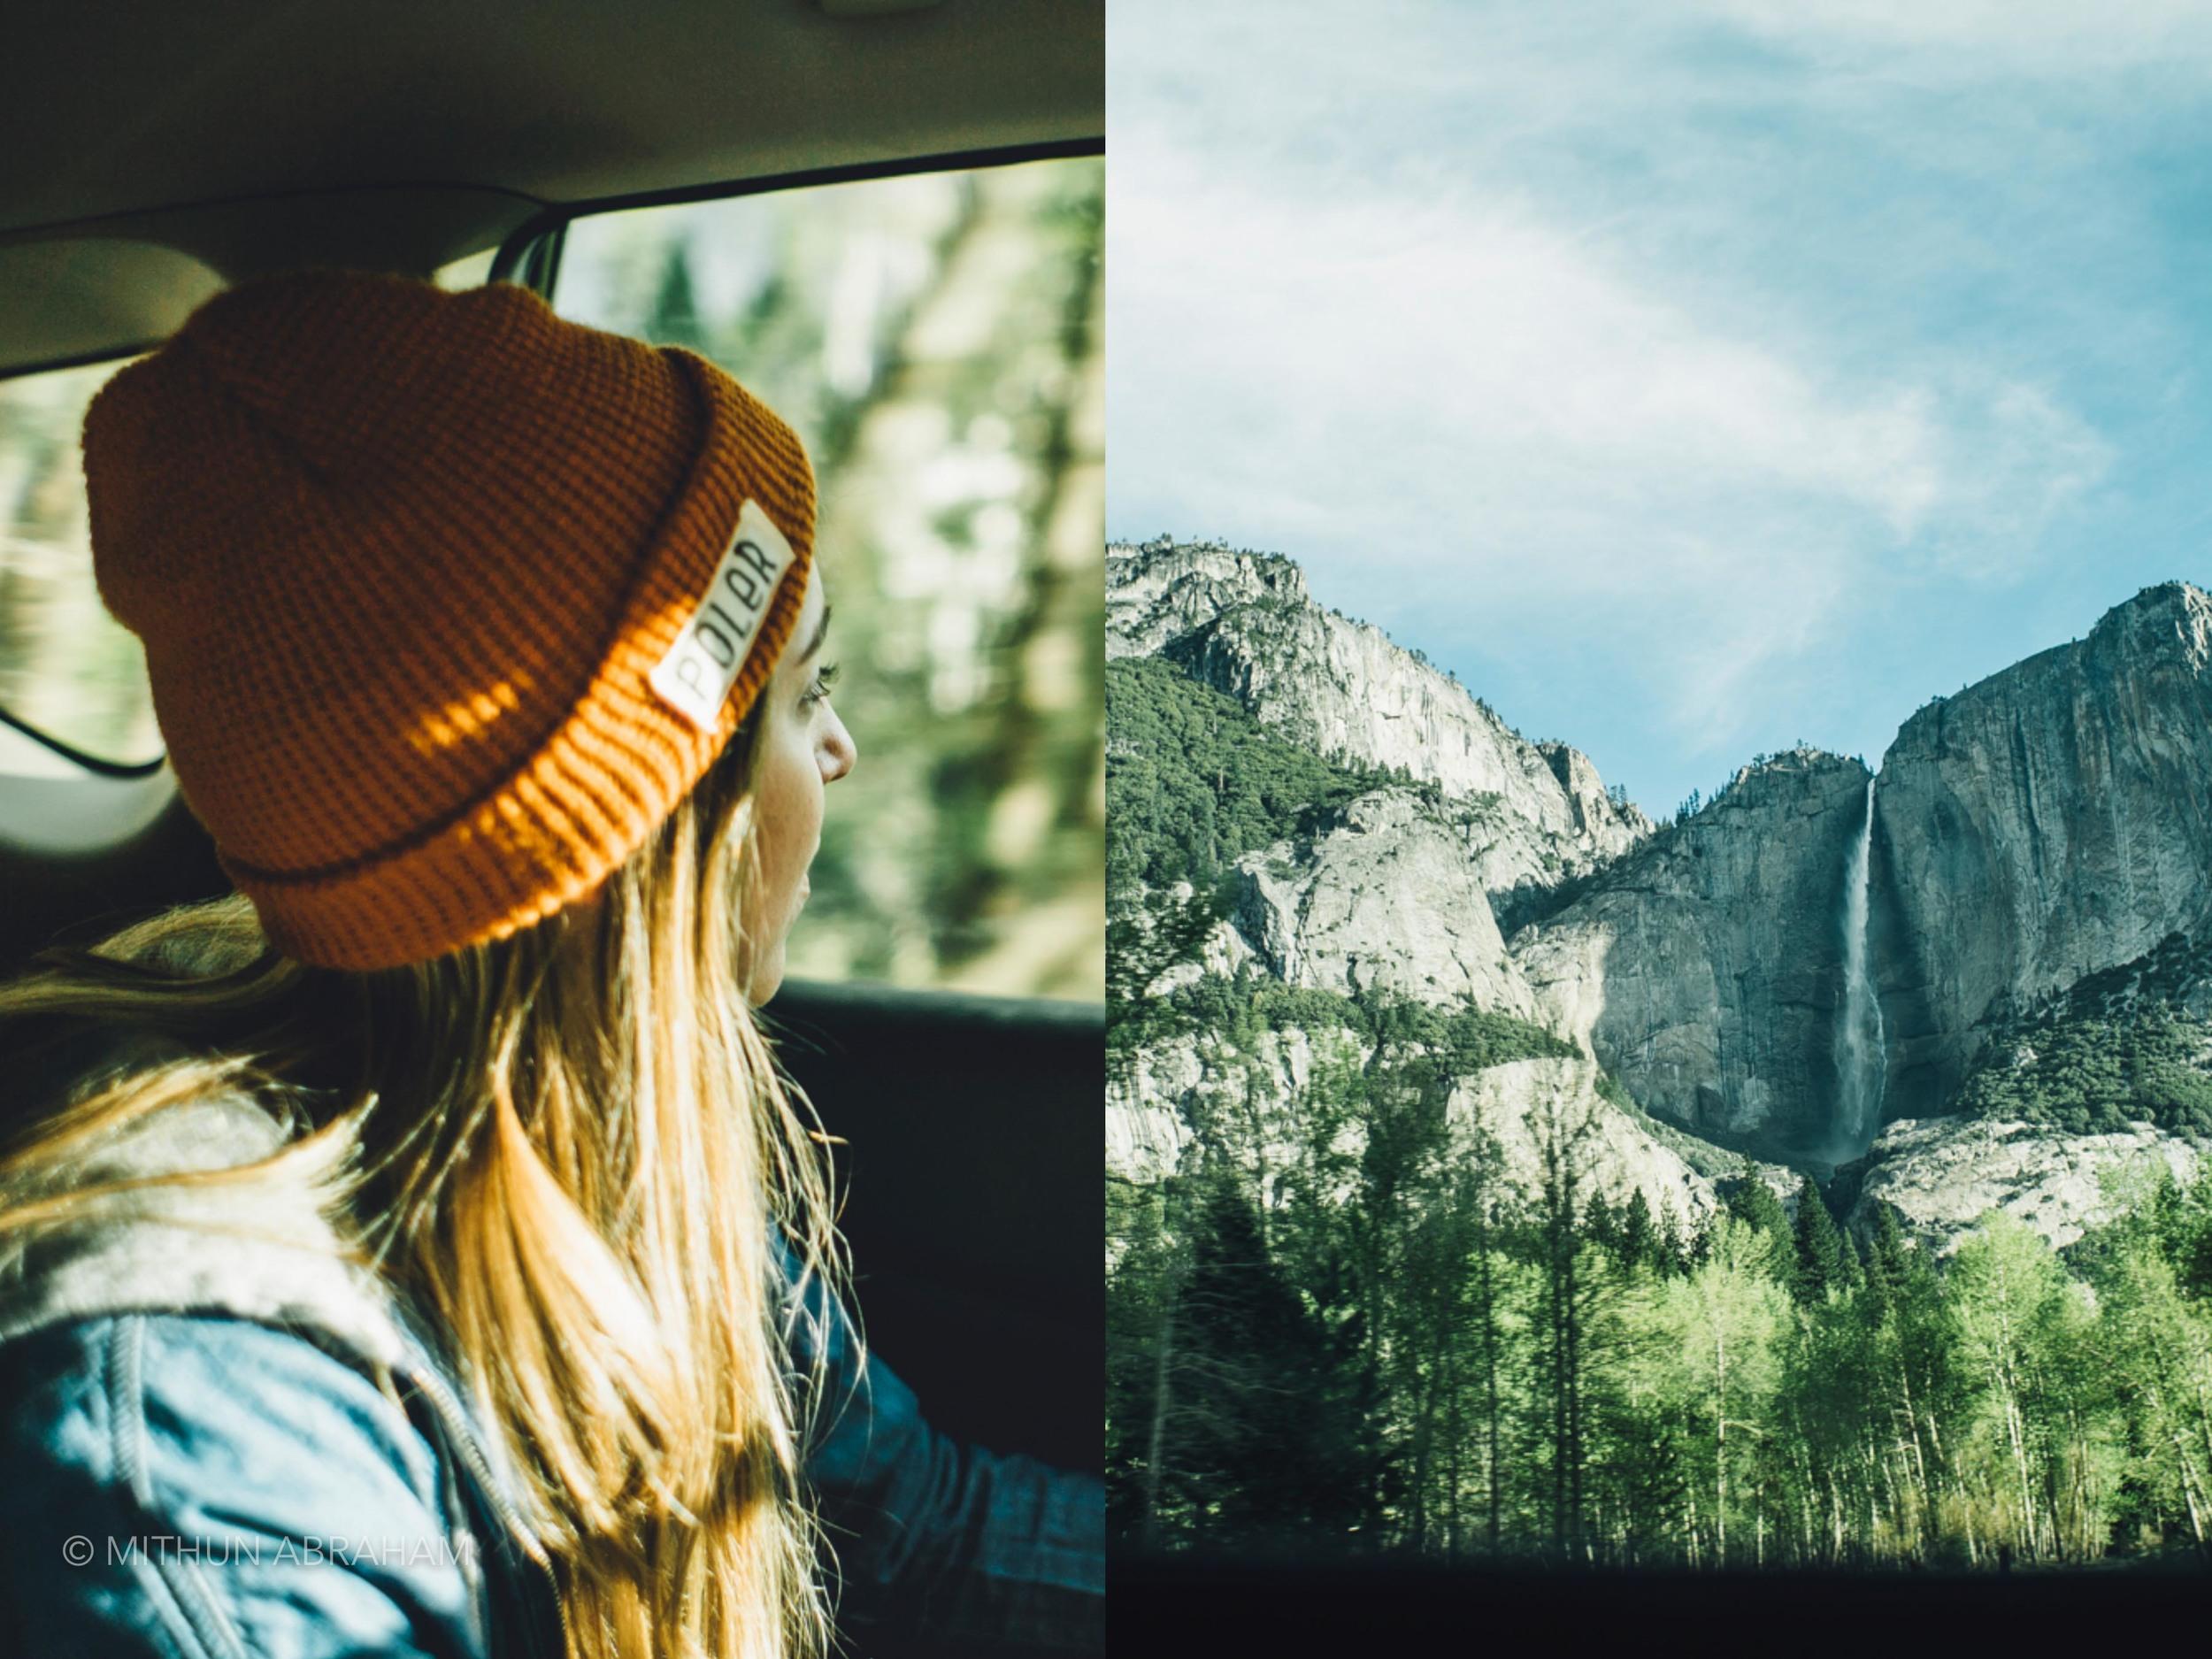 Bruggs looking out at Yosemite.jpg